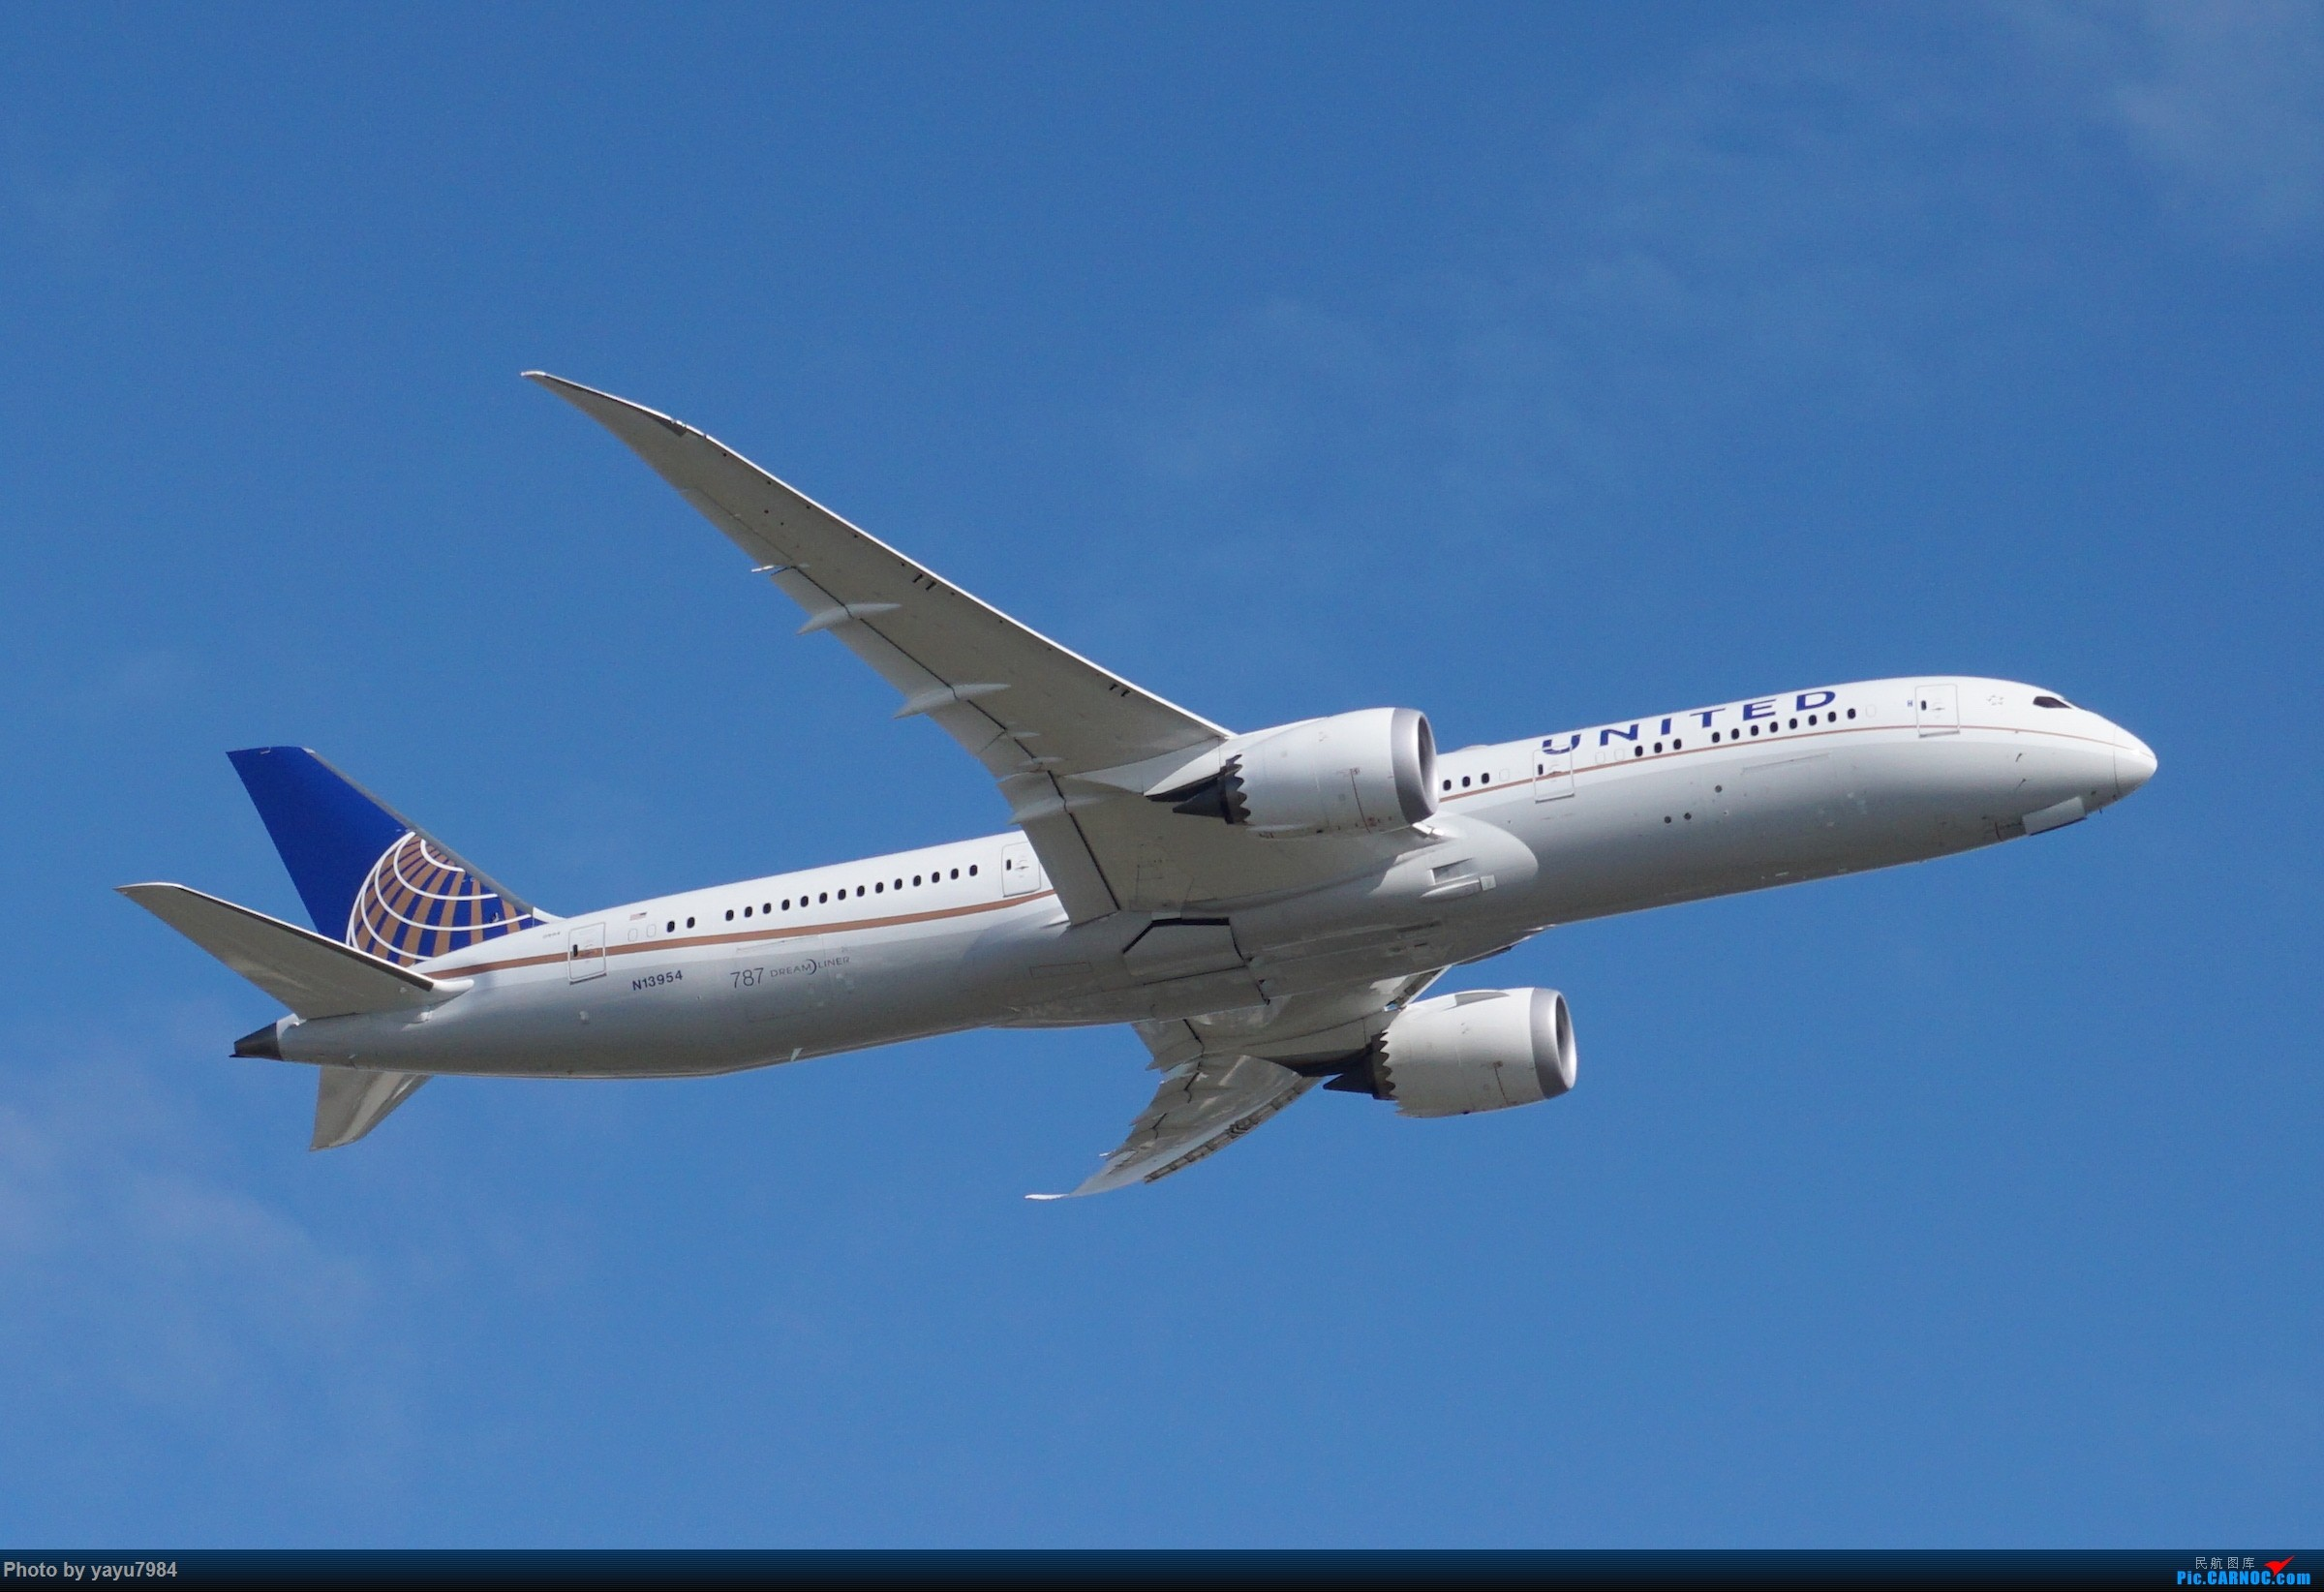 Re:[原创][SYD] 近期随摄,收获颇多 BOEING 787-9 N13954 澳大利亚悉尼金斯福德·史密斯机场